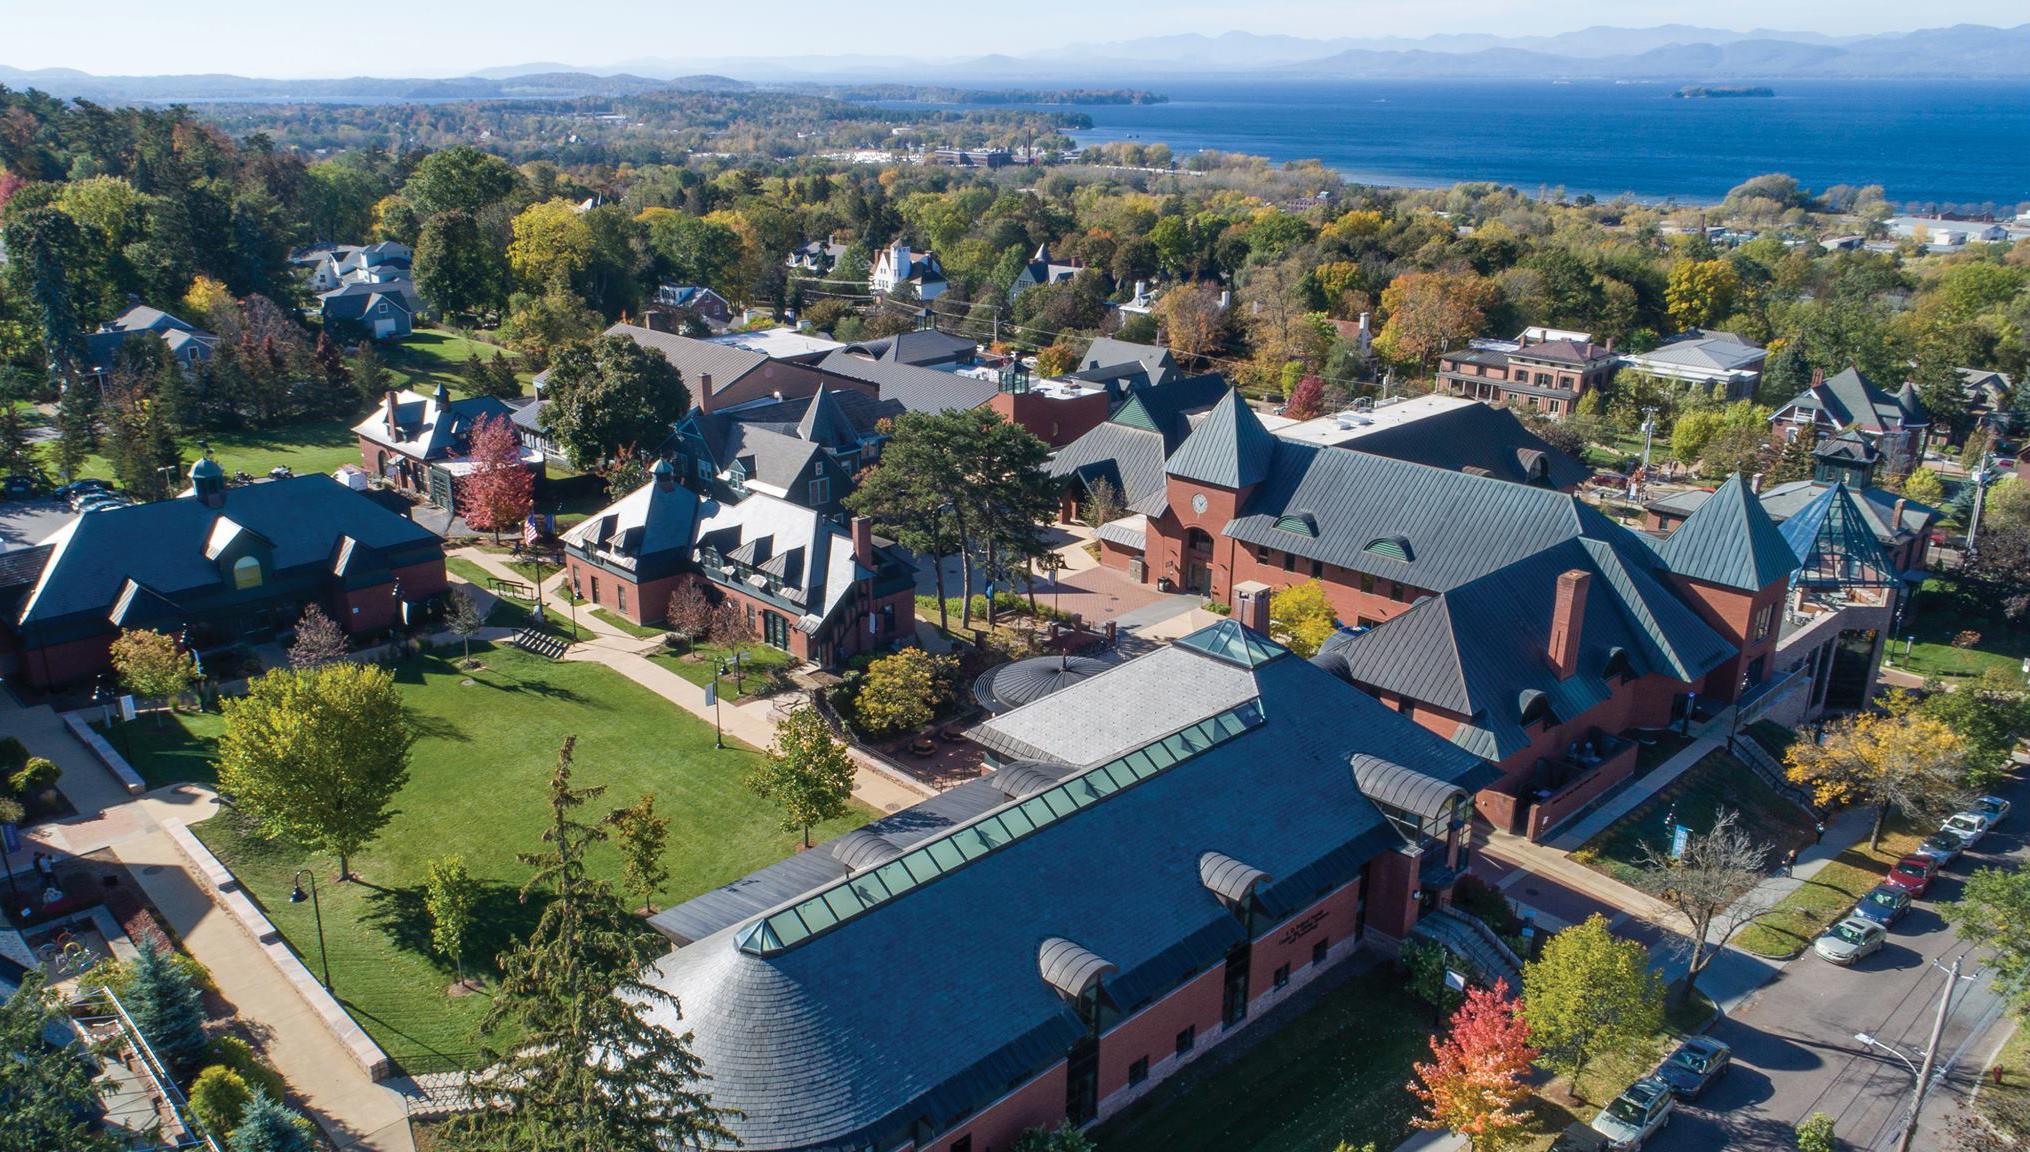 Champlaincollege aerialview